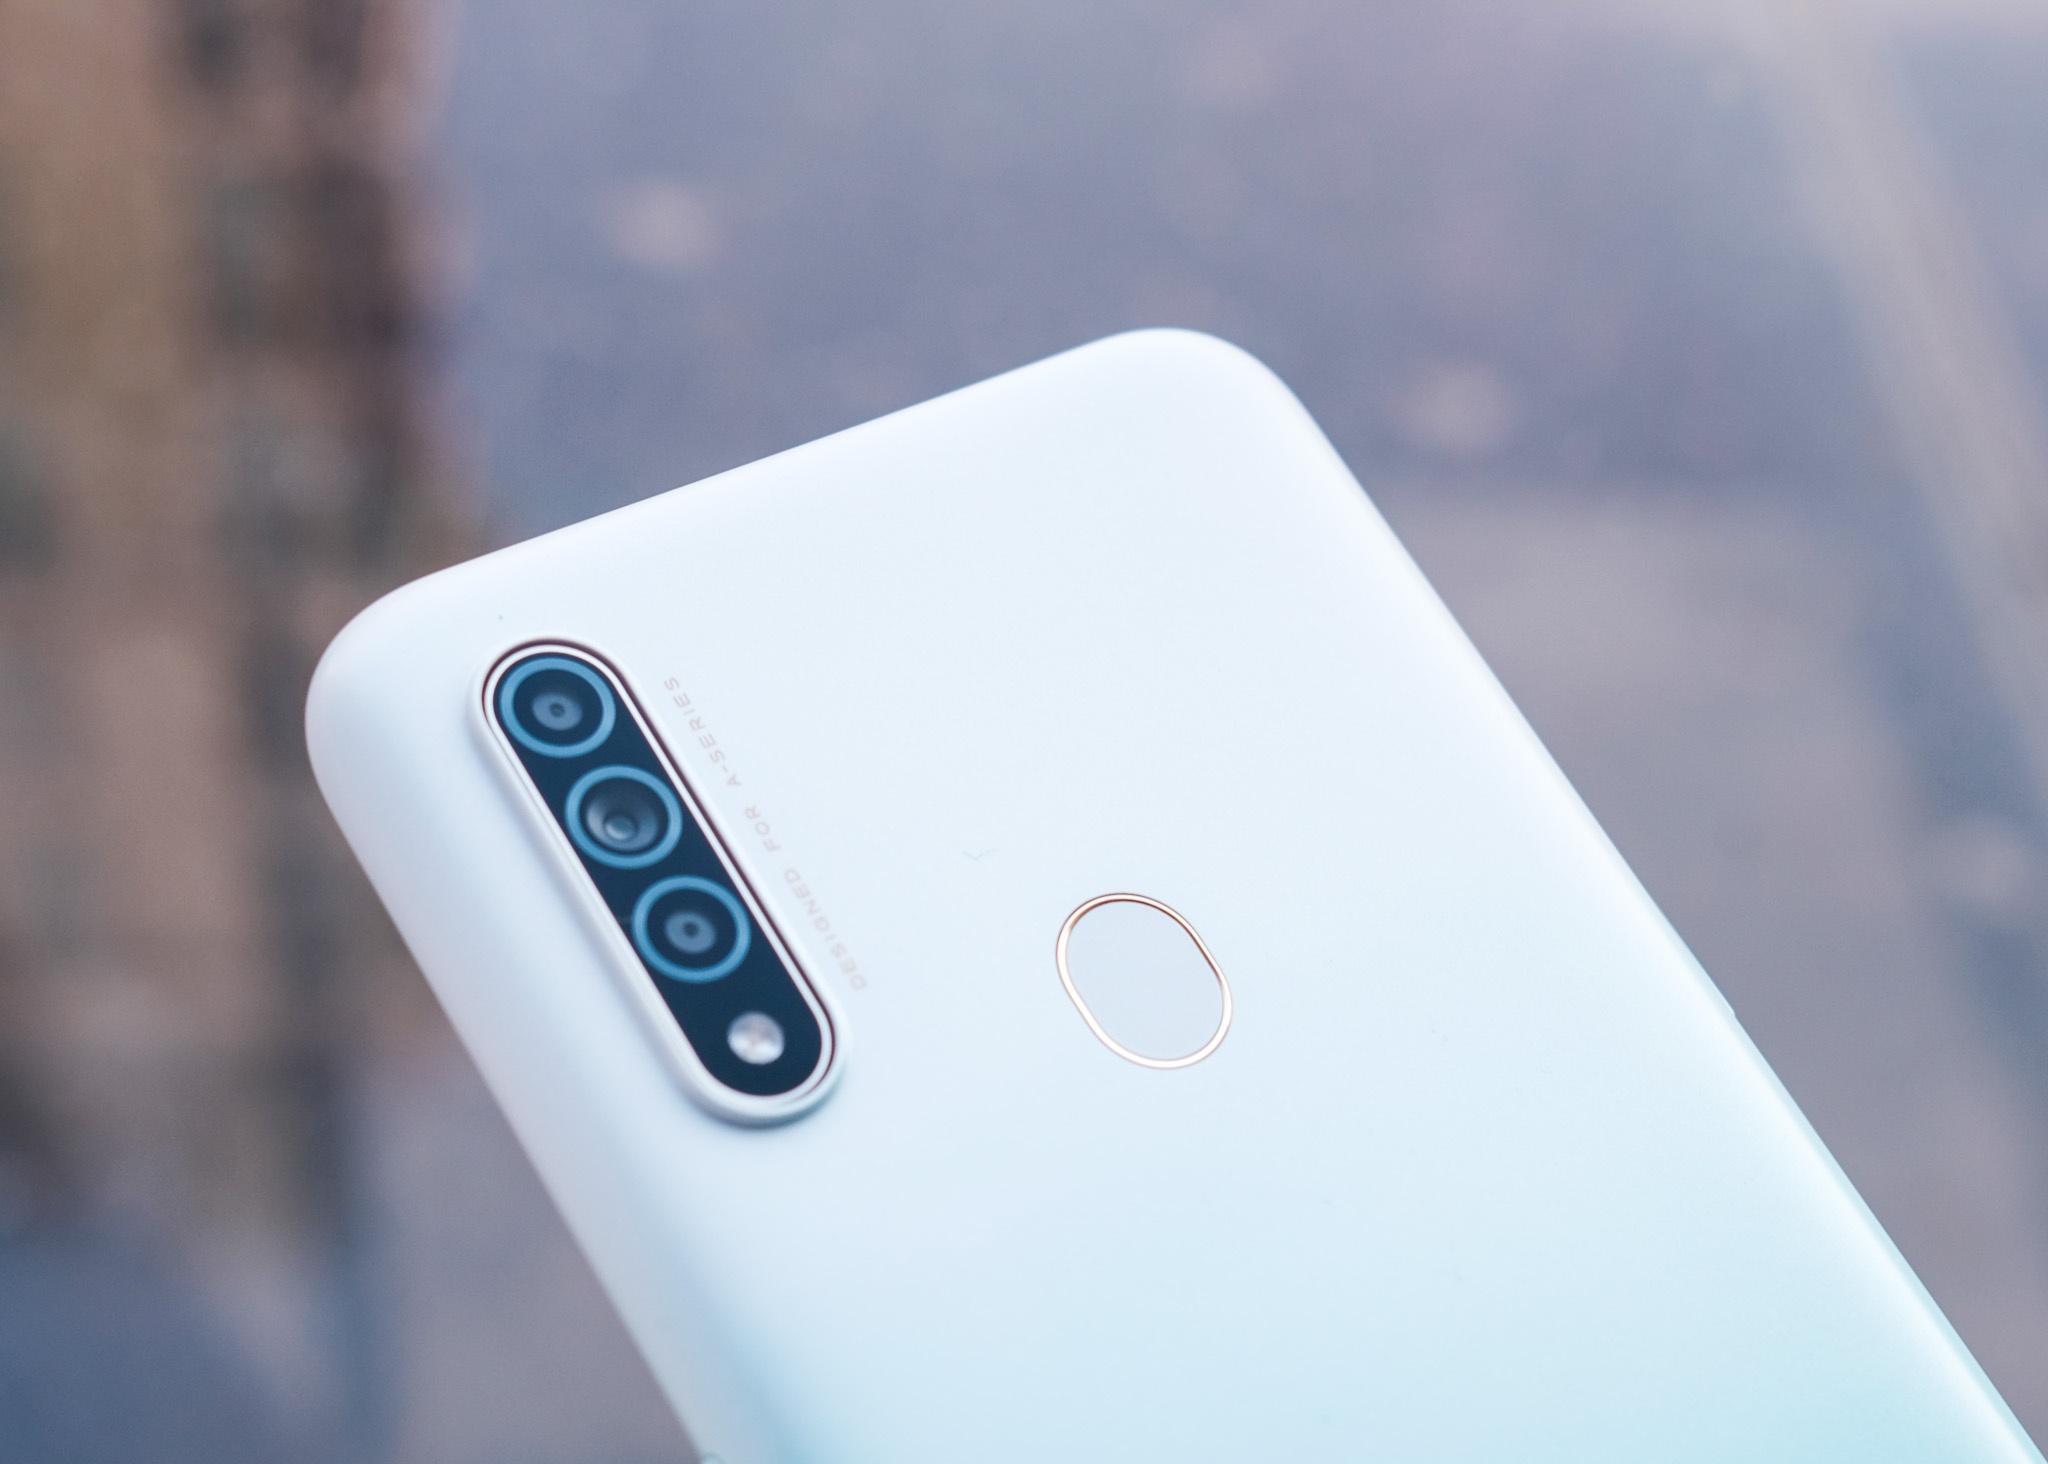 Mo hop Oppo A31 - man hinh lon, 3 camera, gia 4,5 trieu hinh anh 10 DSCF0455.jpg